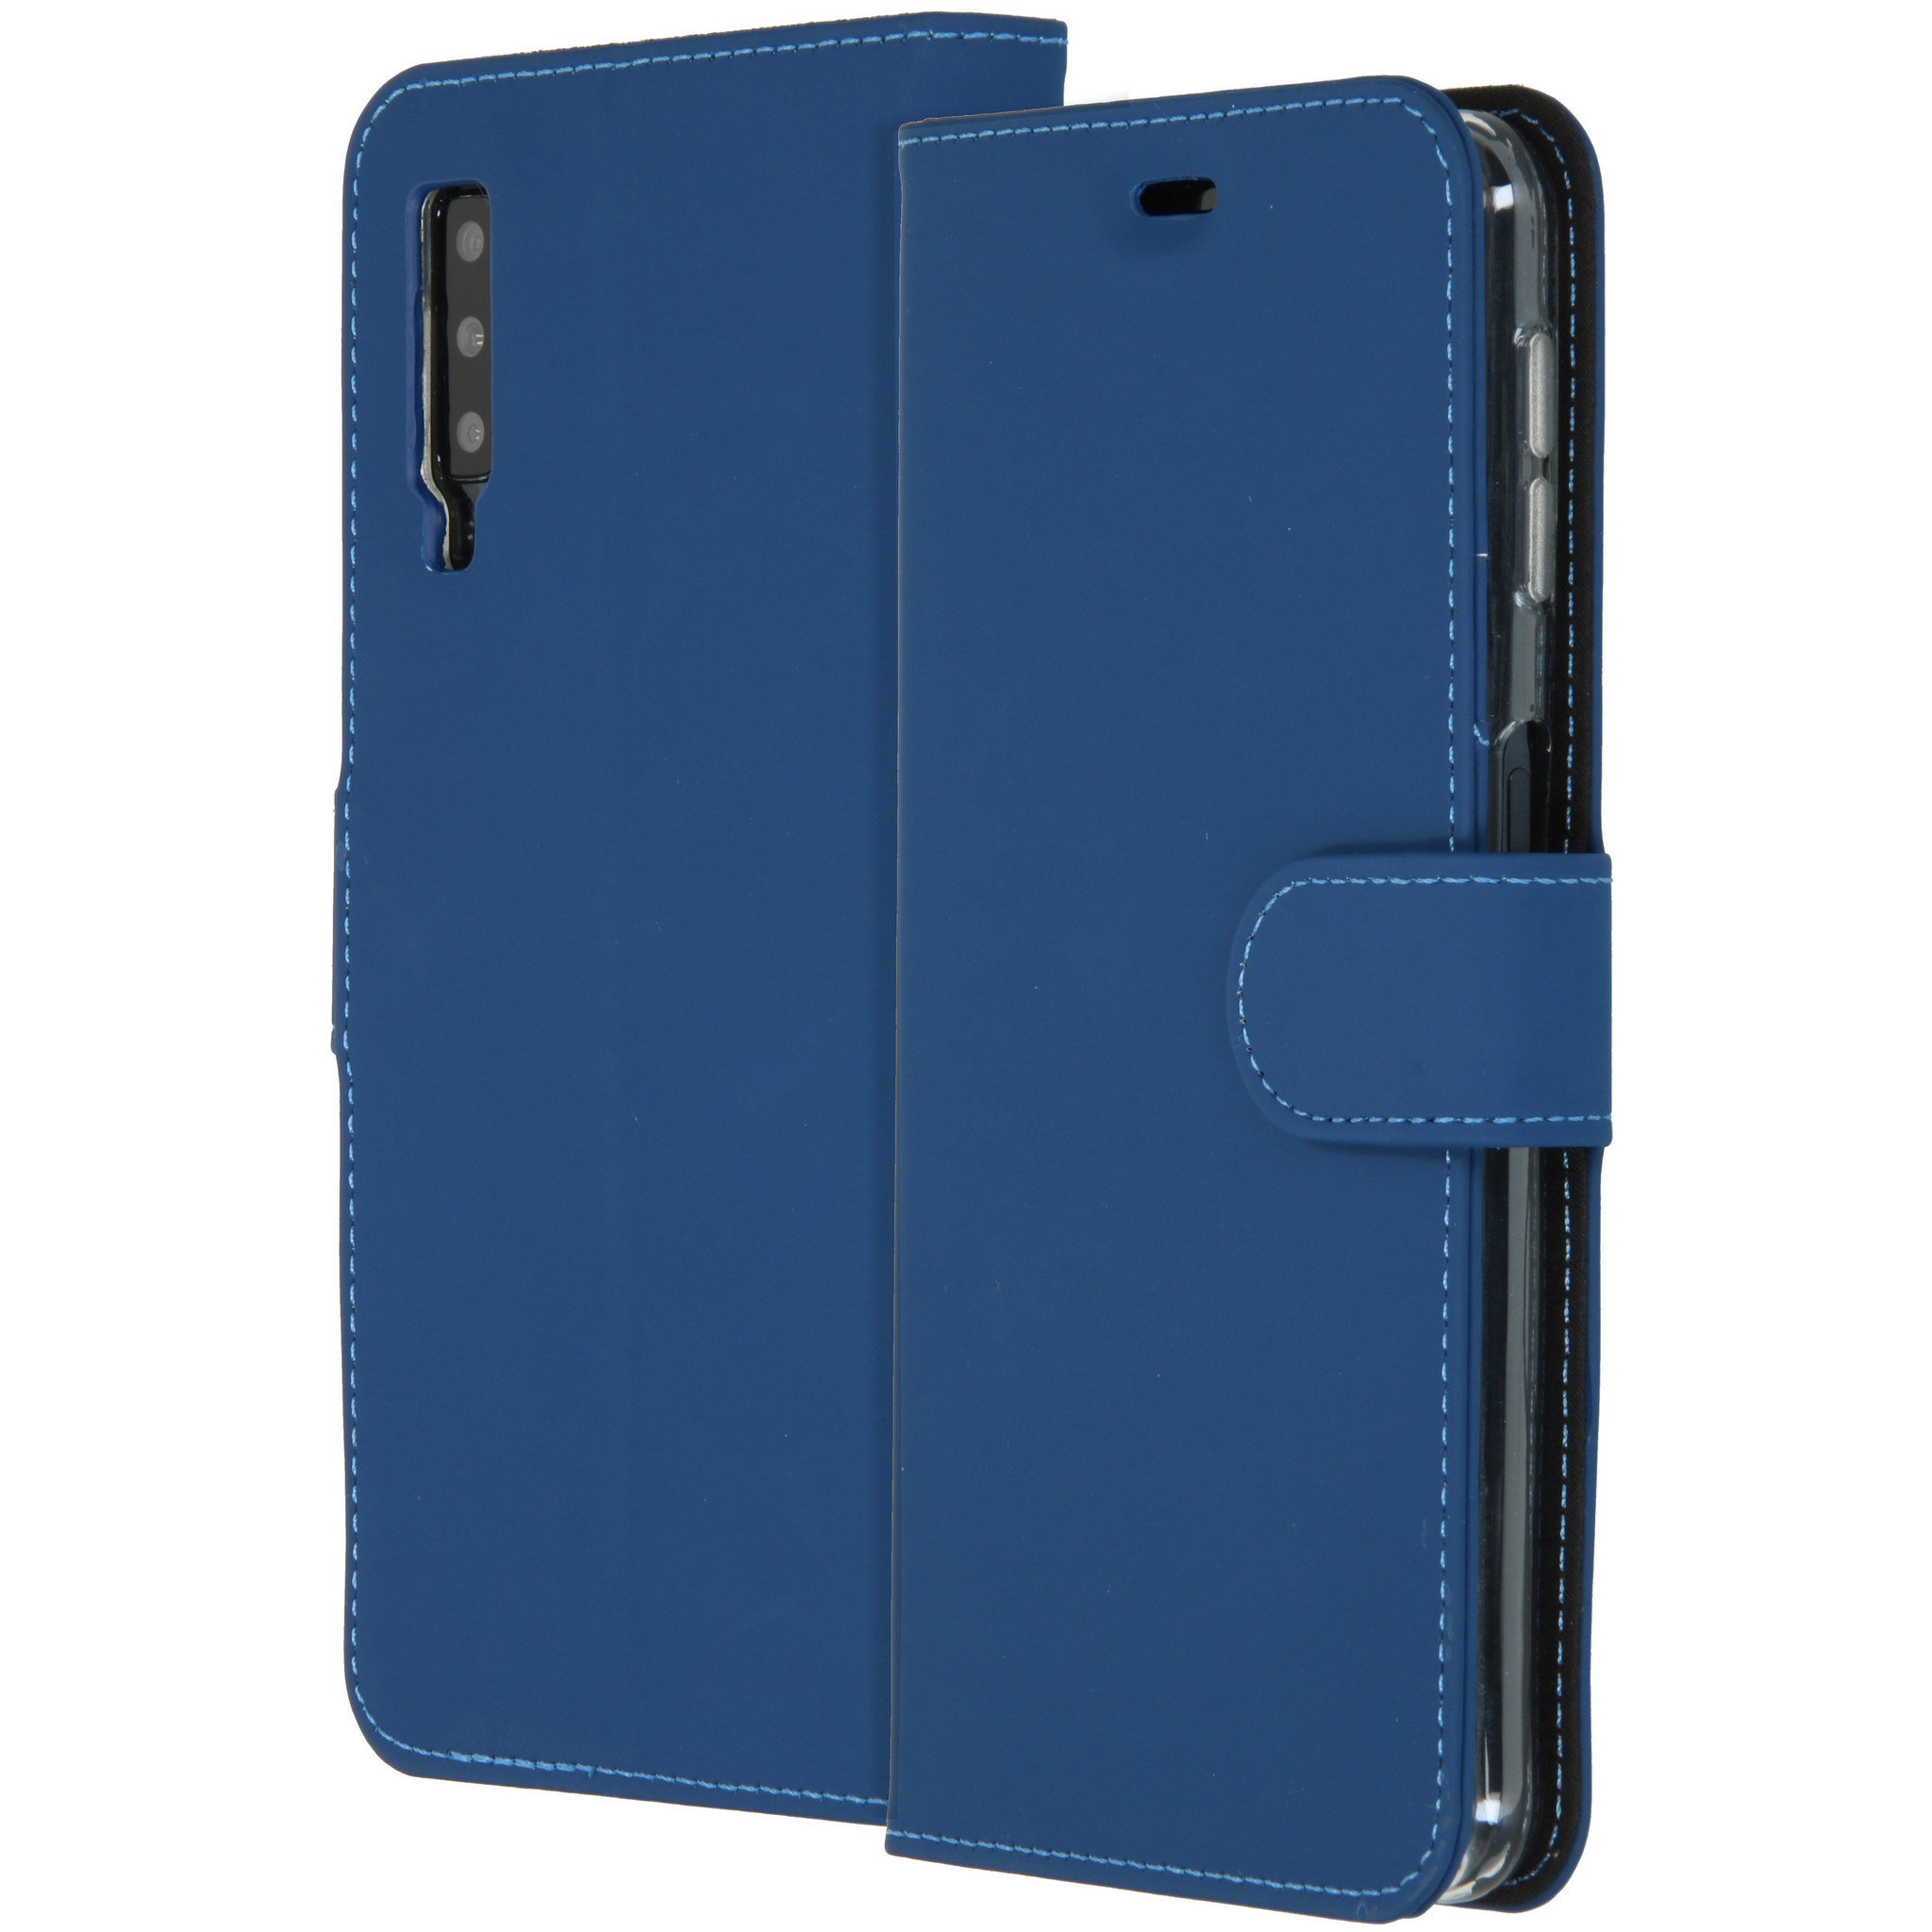 Accezz Wallet TPU Booklet Blau für das Samsung Galaxy A7 (2018)